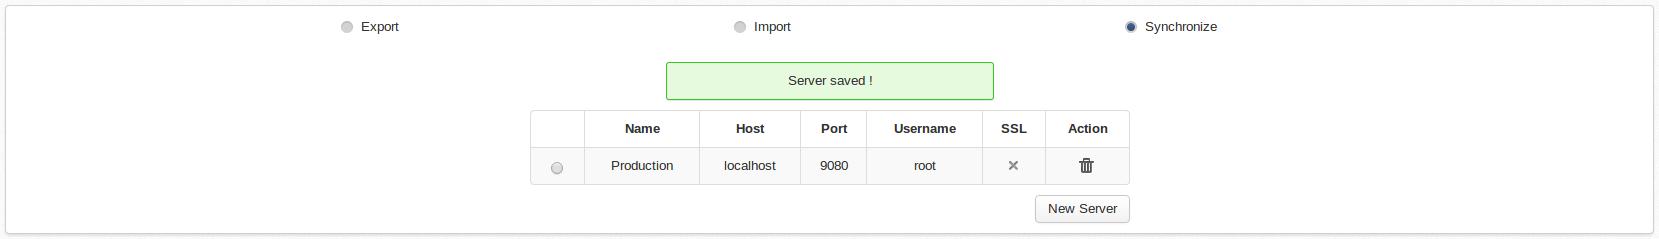 02-sync_servers_saved